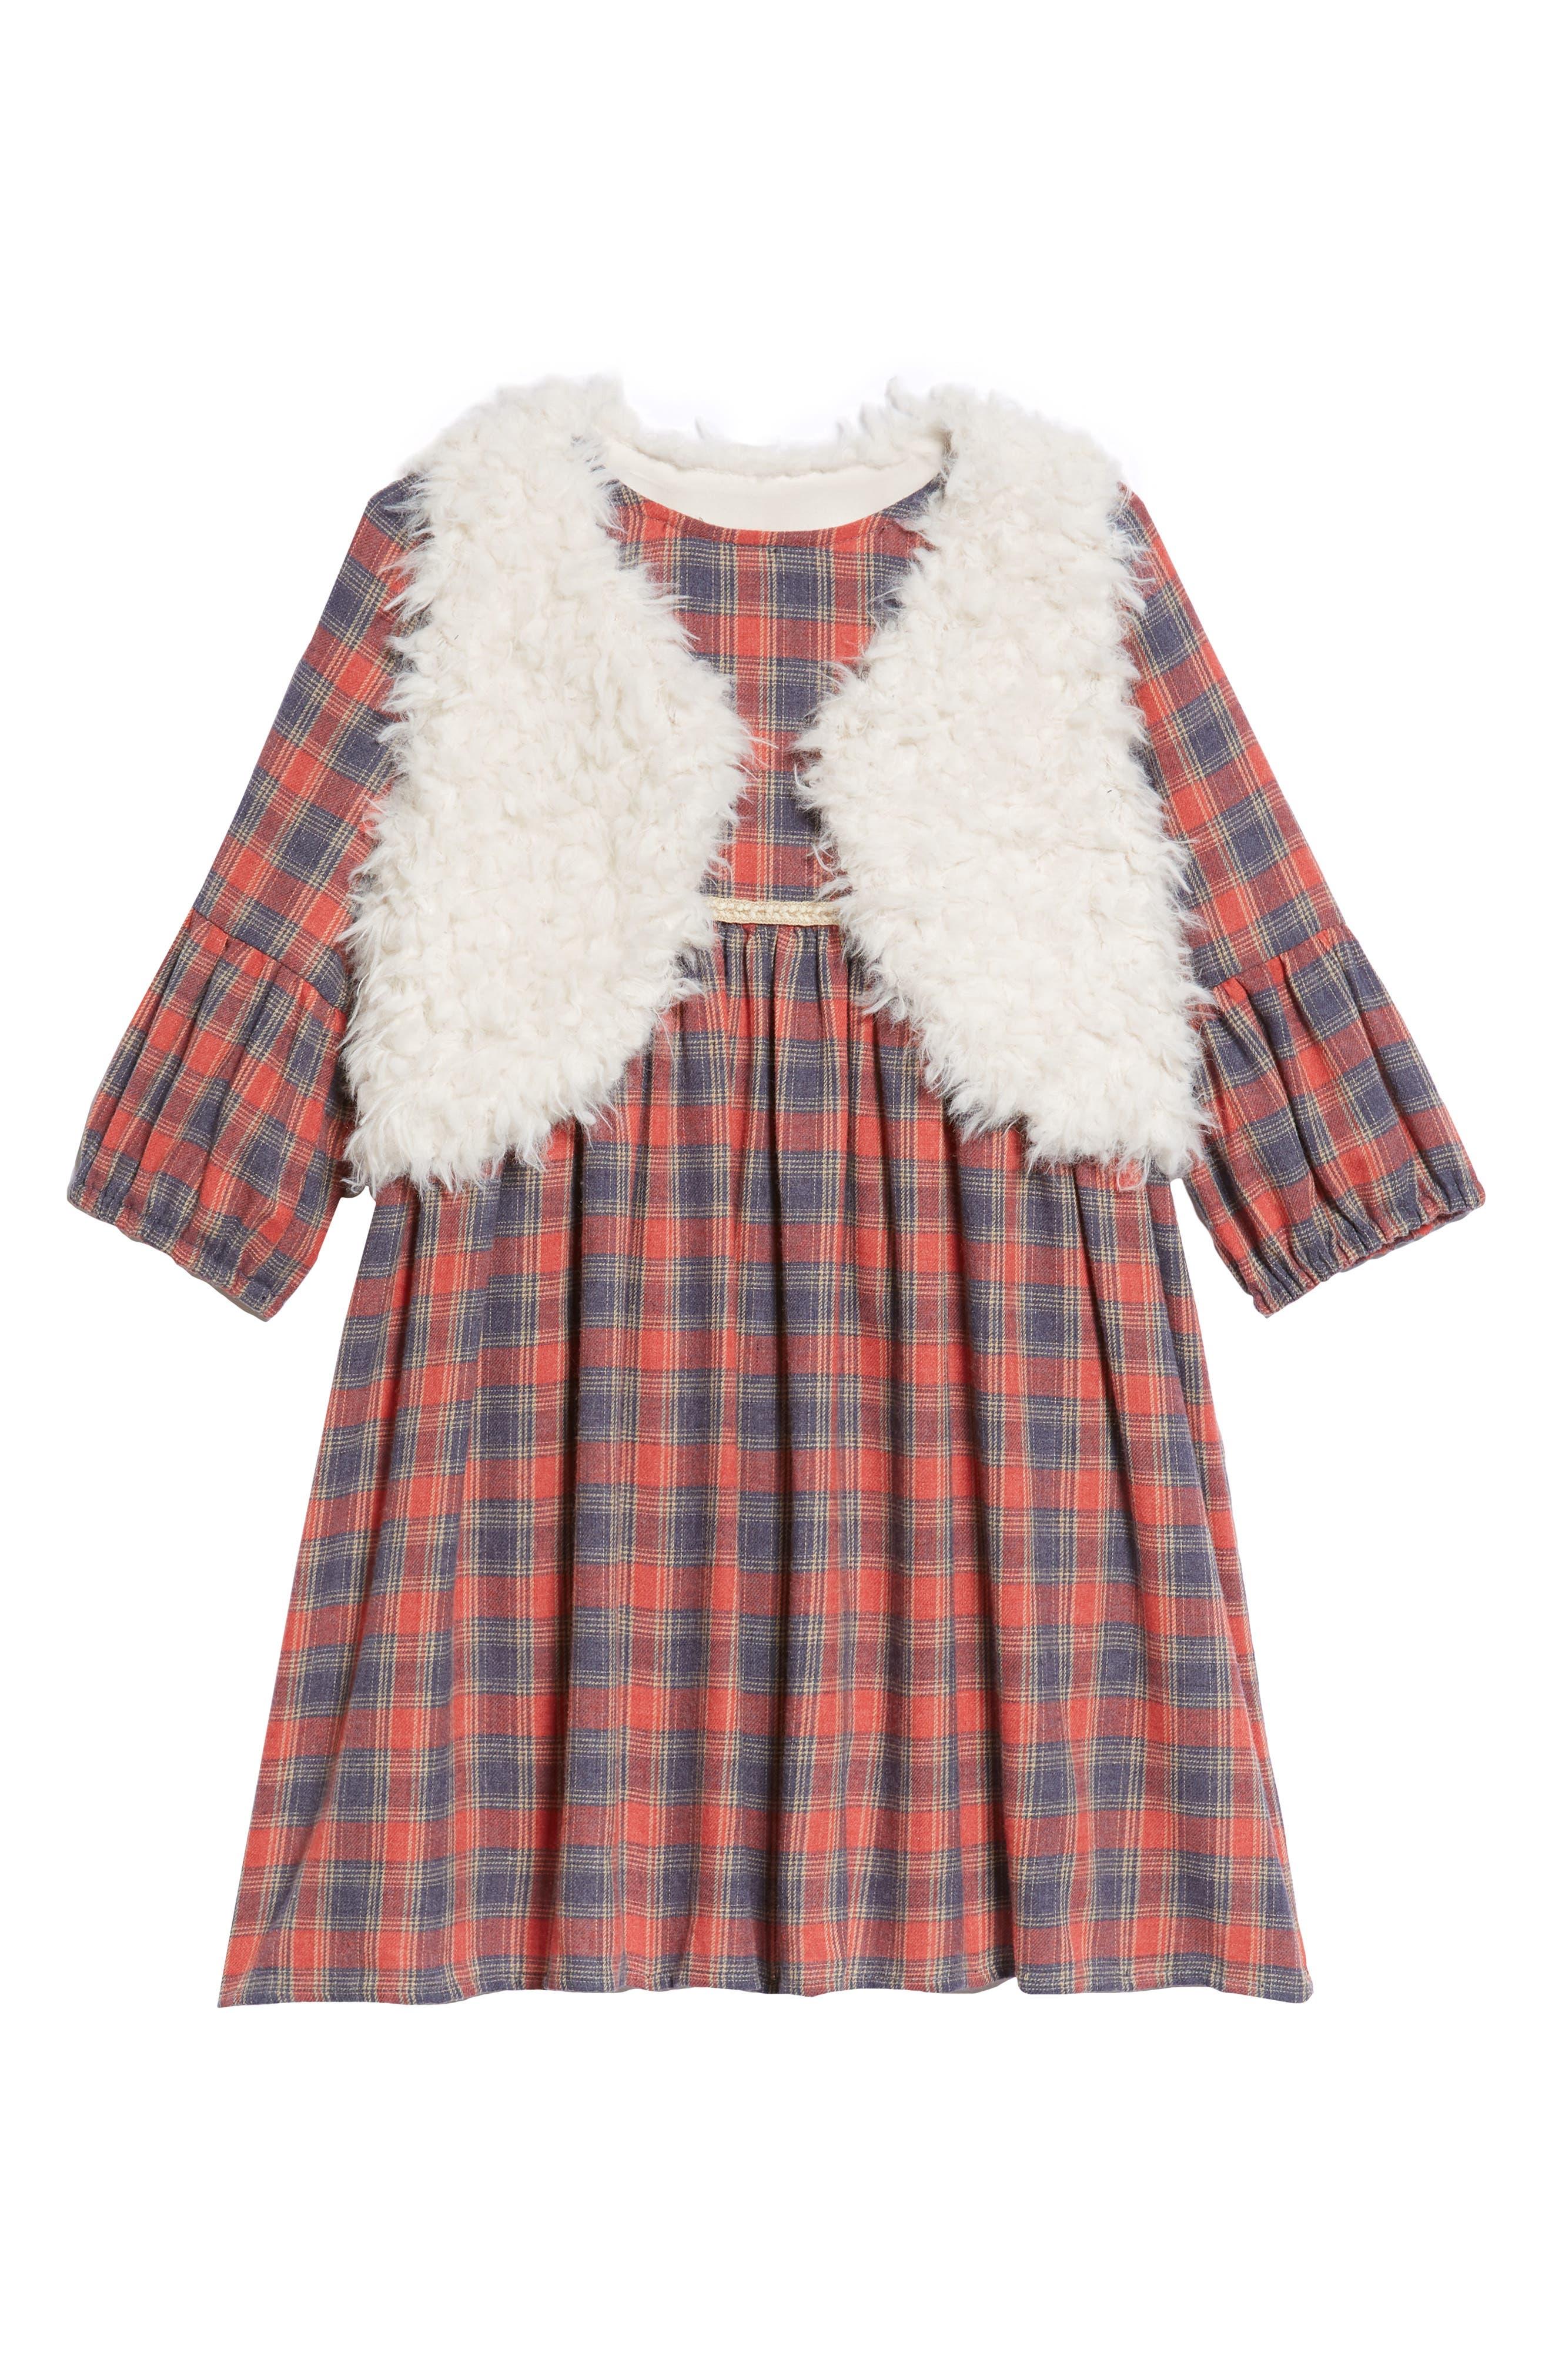 Toddler Girls Pippa  Julie Plaid Dress  Faux Fur Vest Set